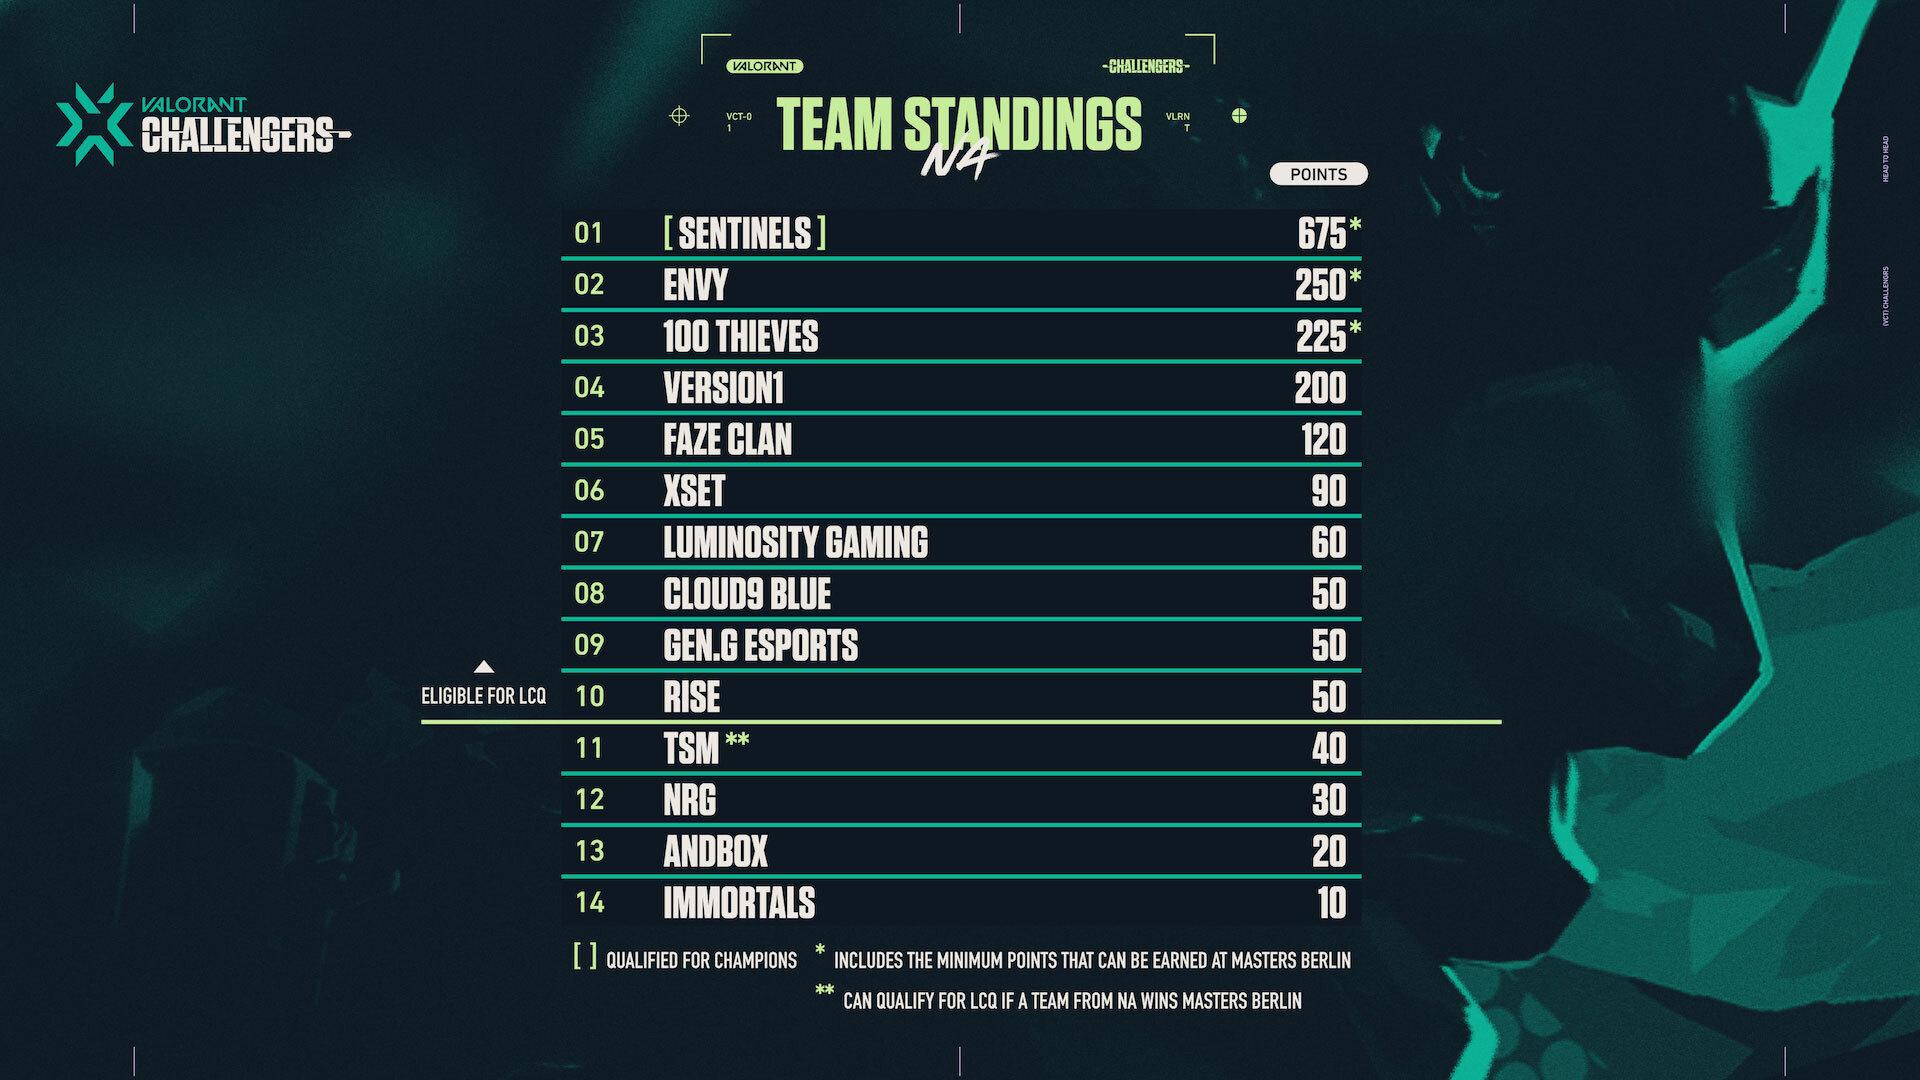 8-23-20-Team-Rankings-optimized.jpg